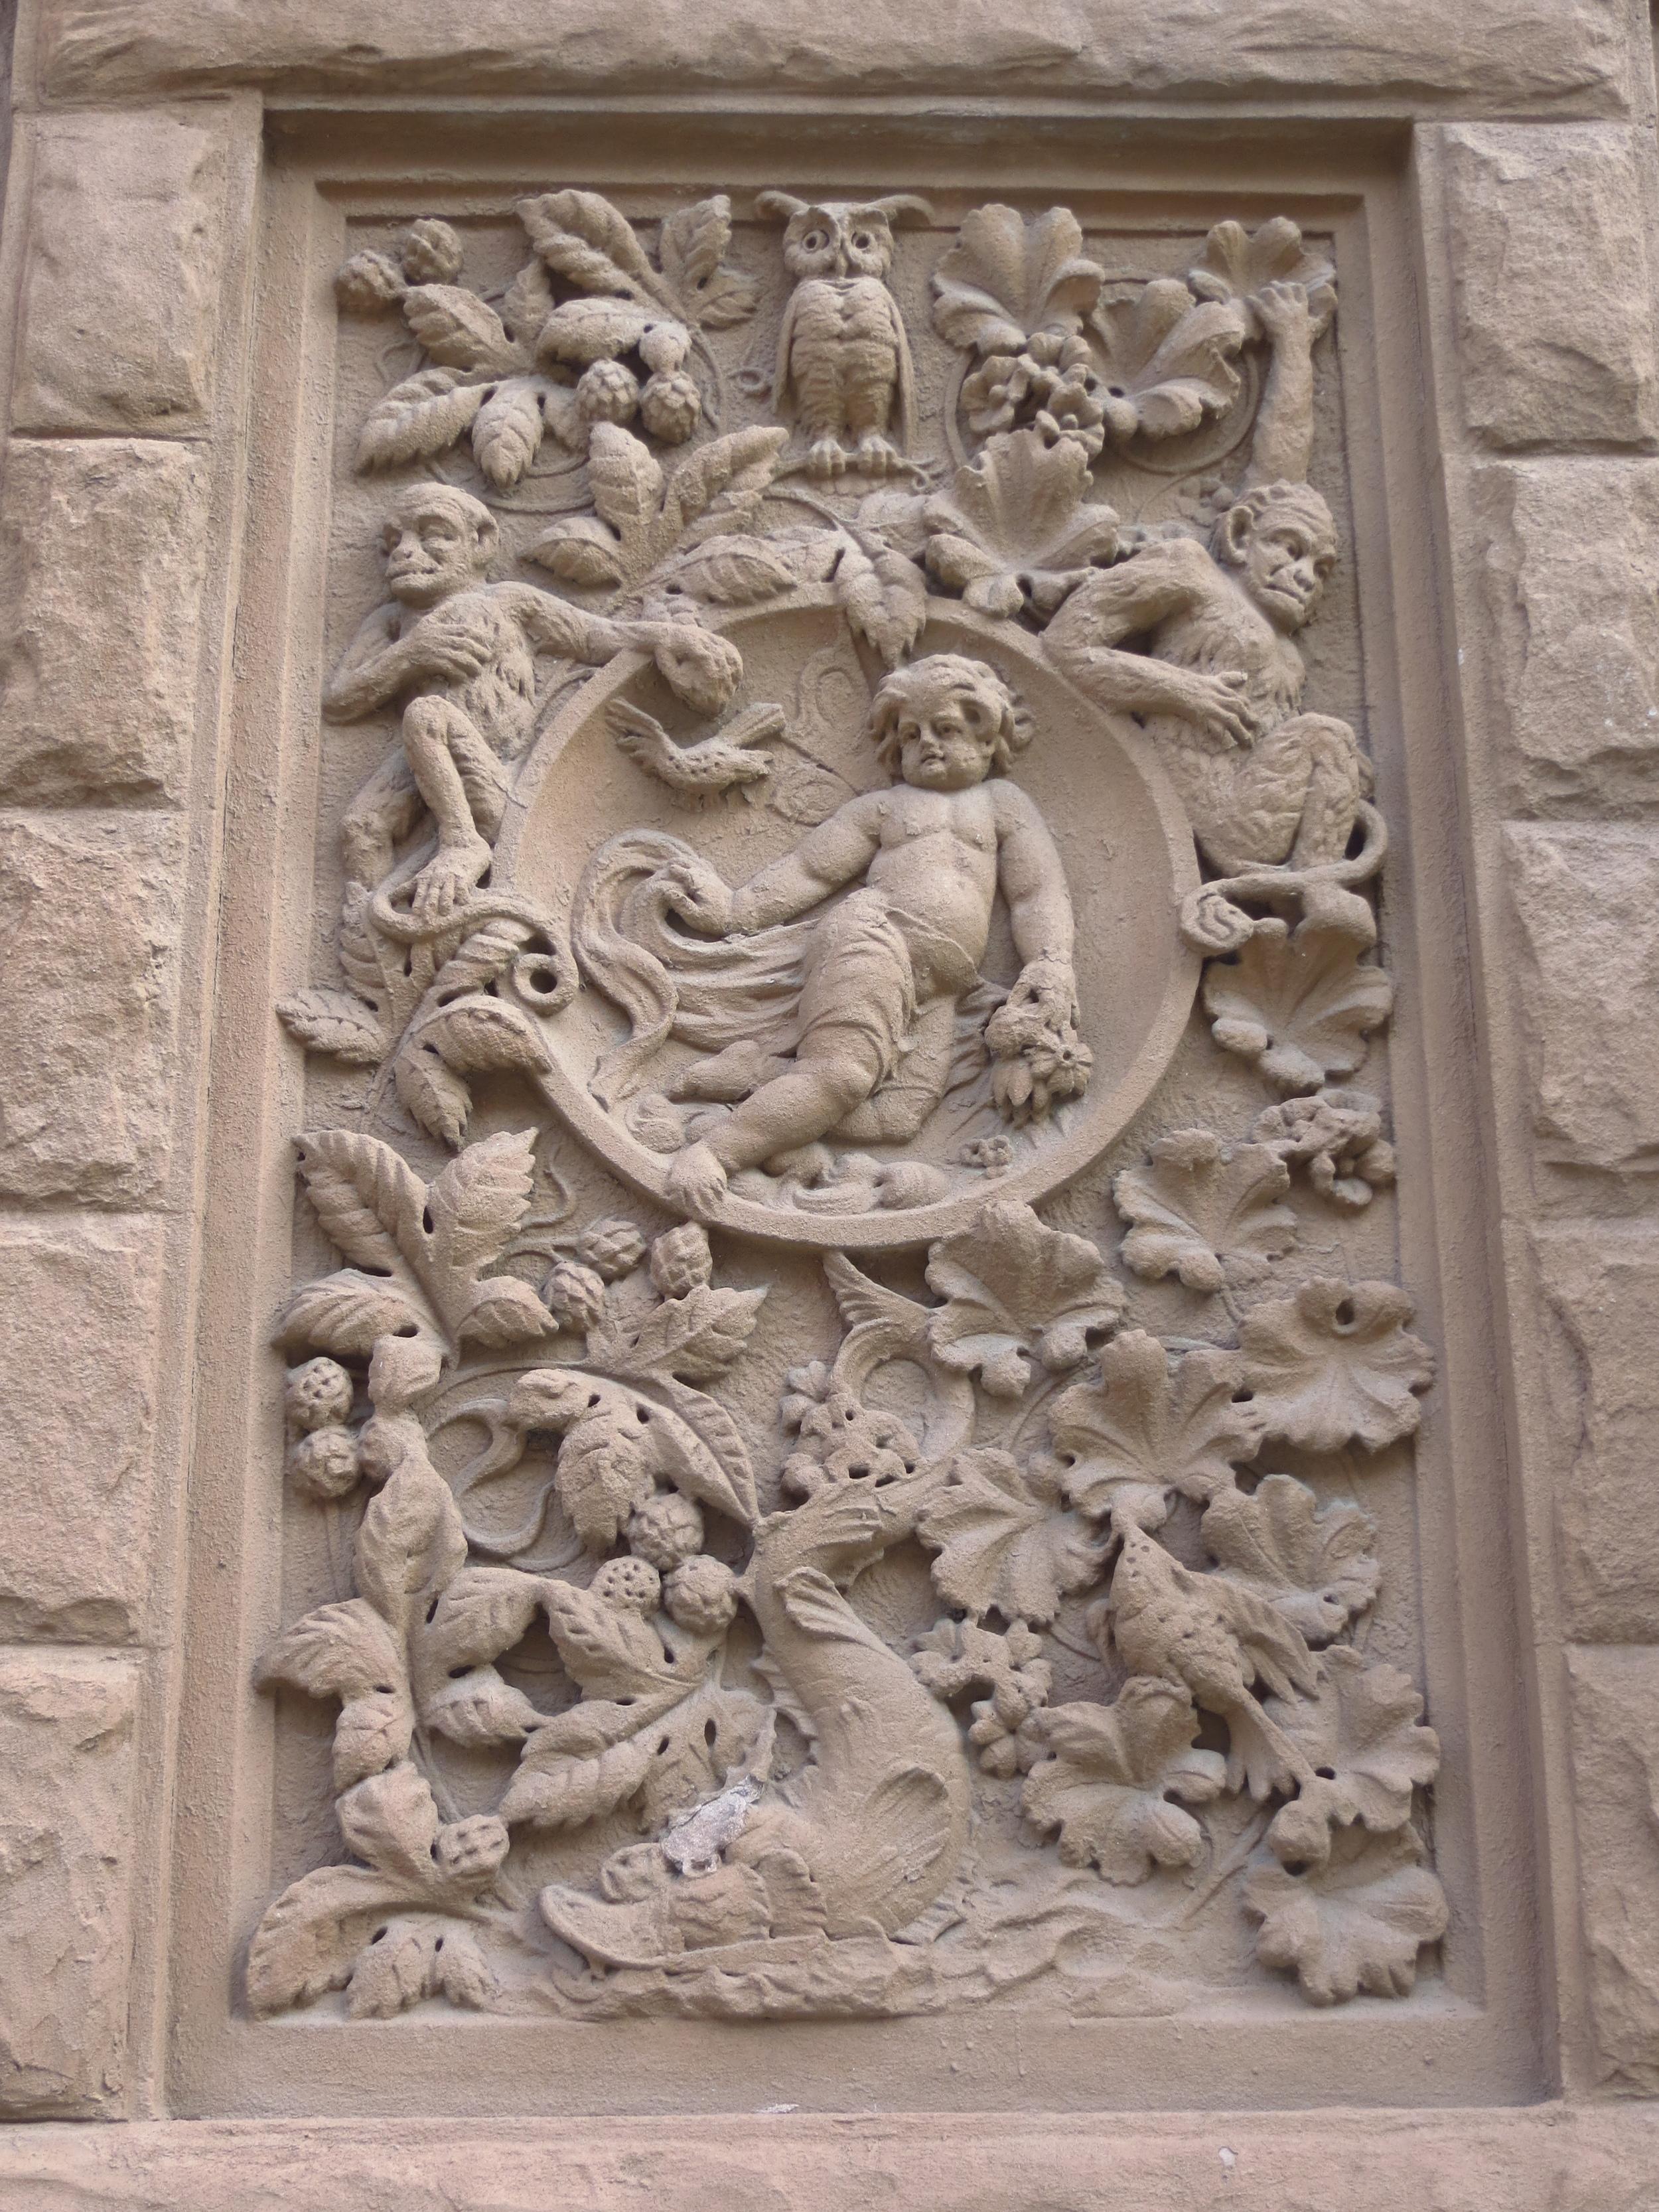 Child and Monkeys